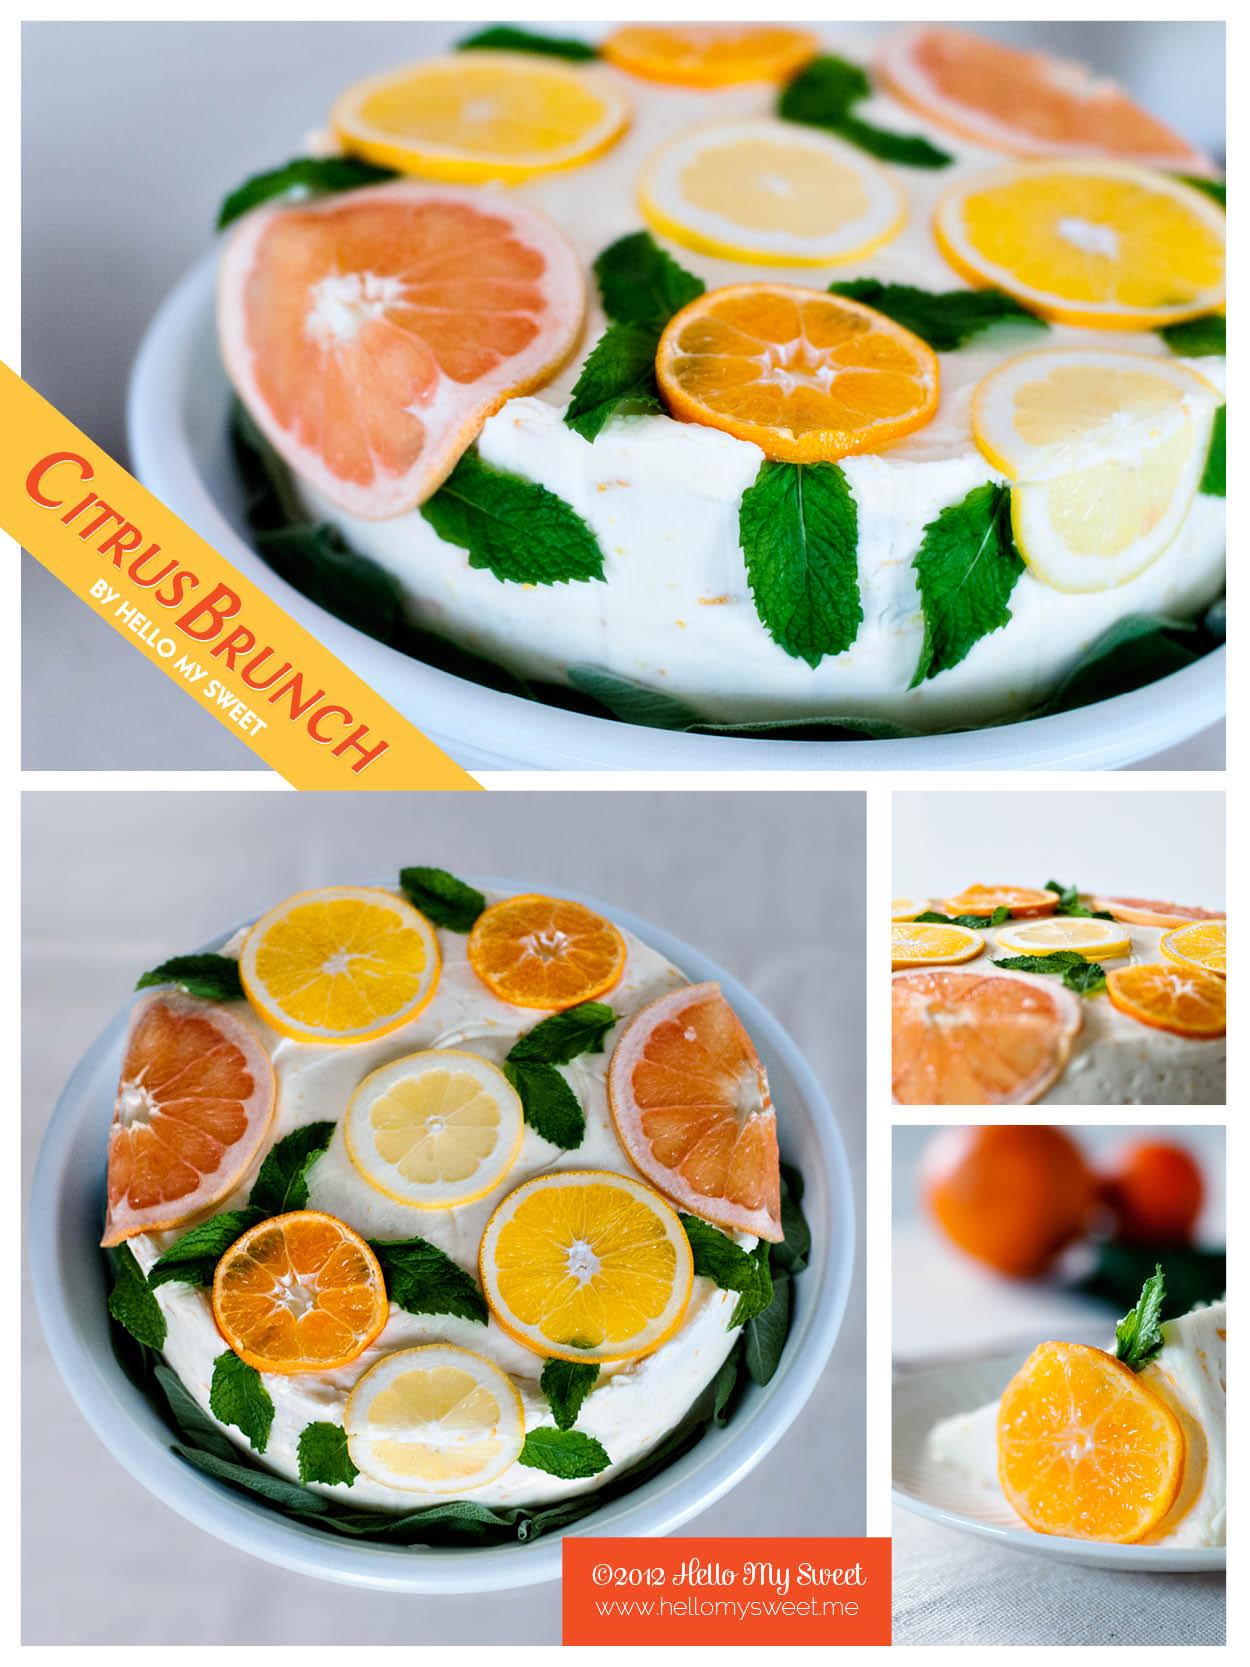 CitrusBrunchblog6.jpg